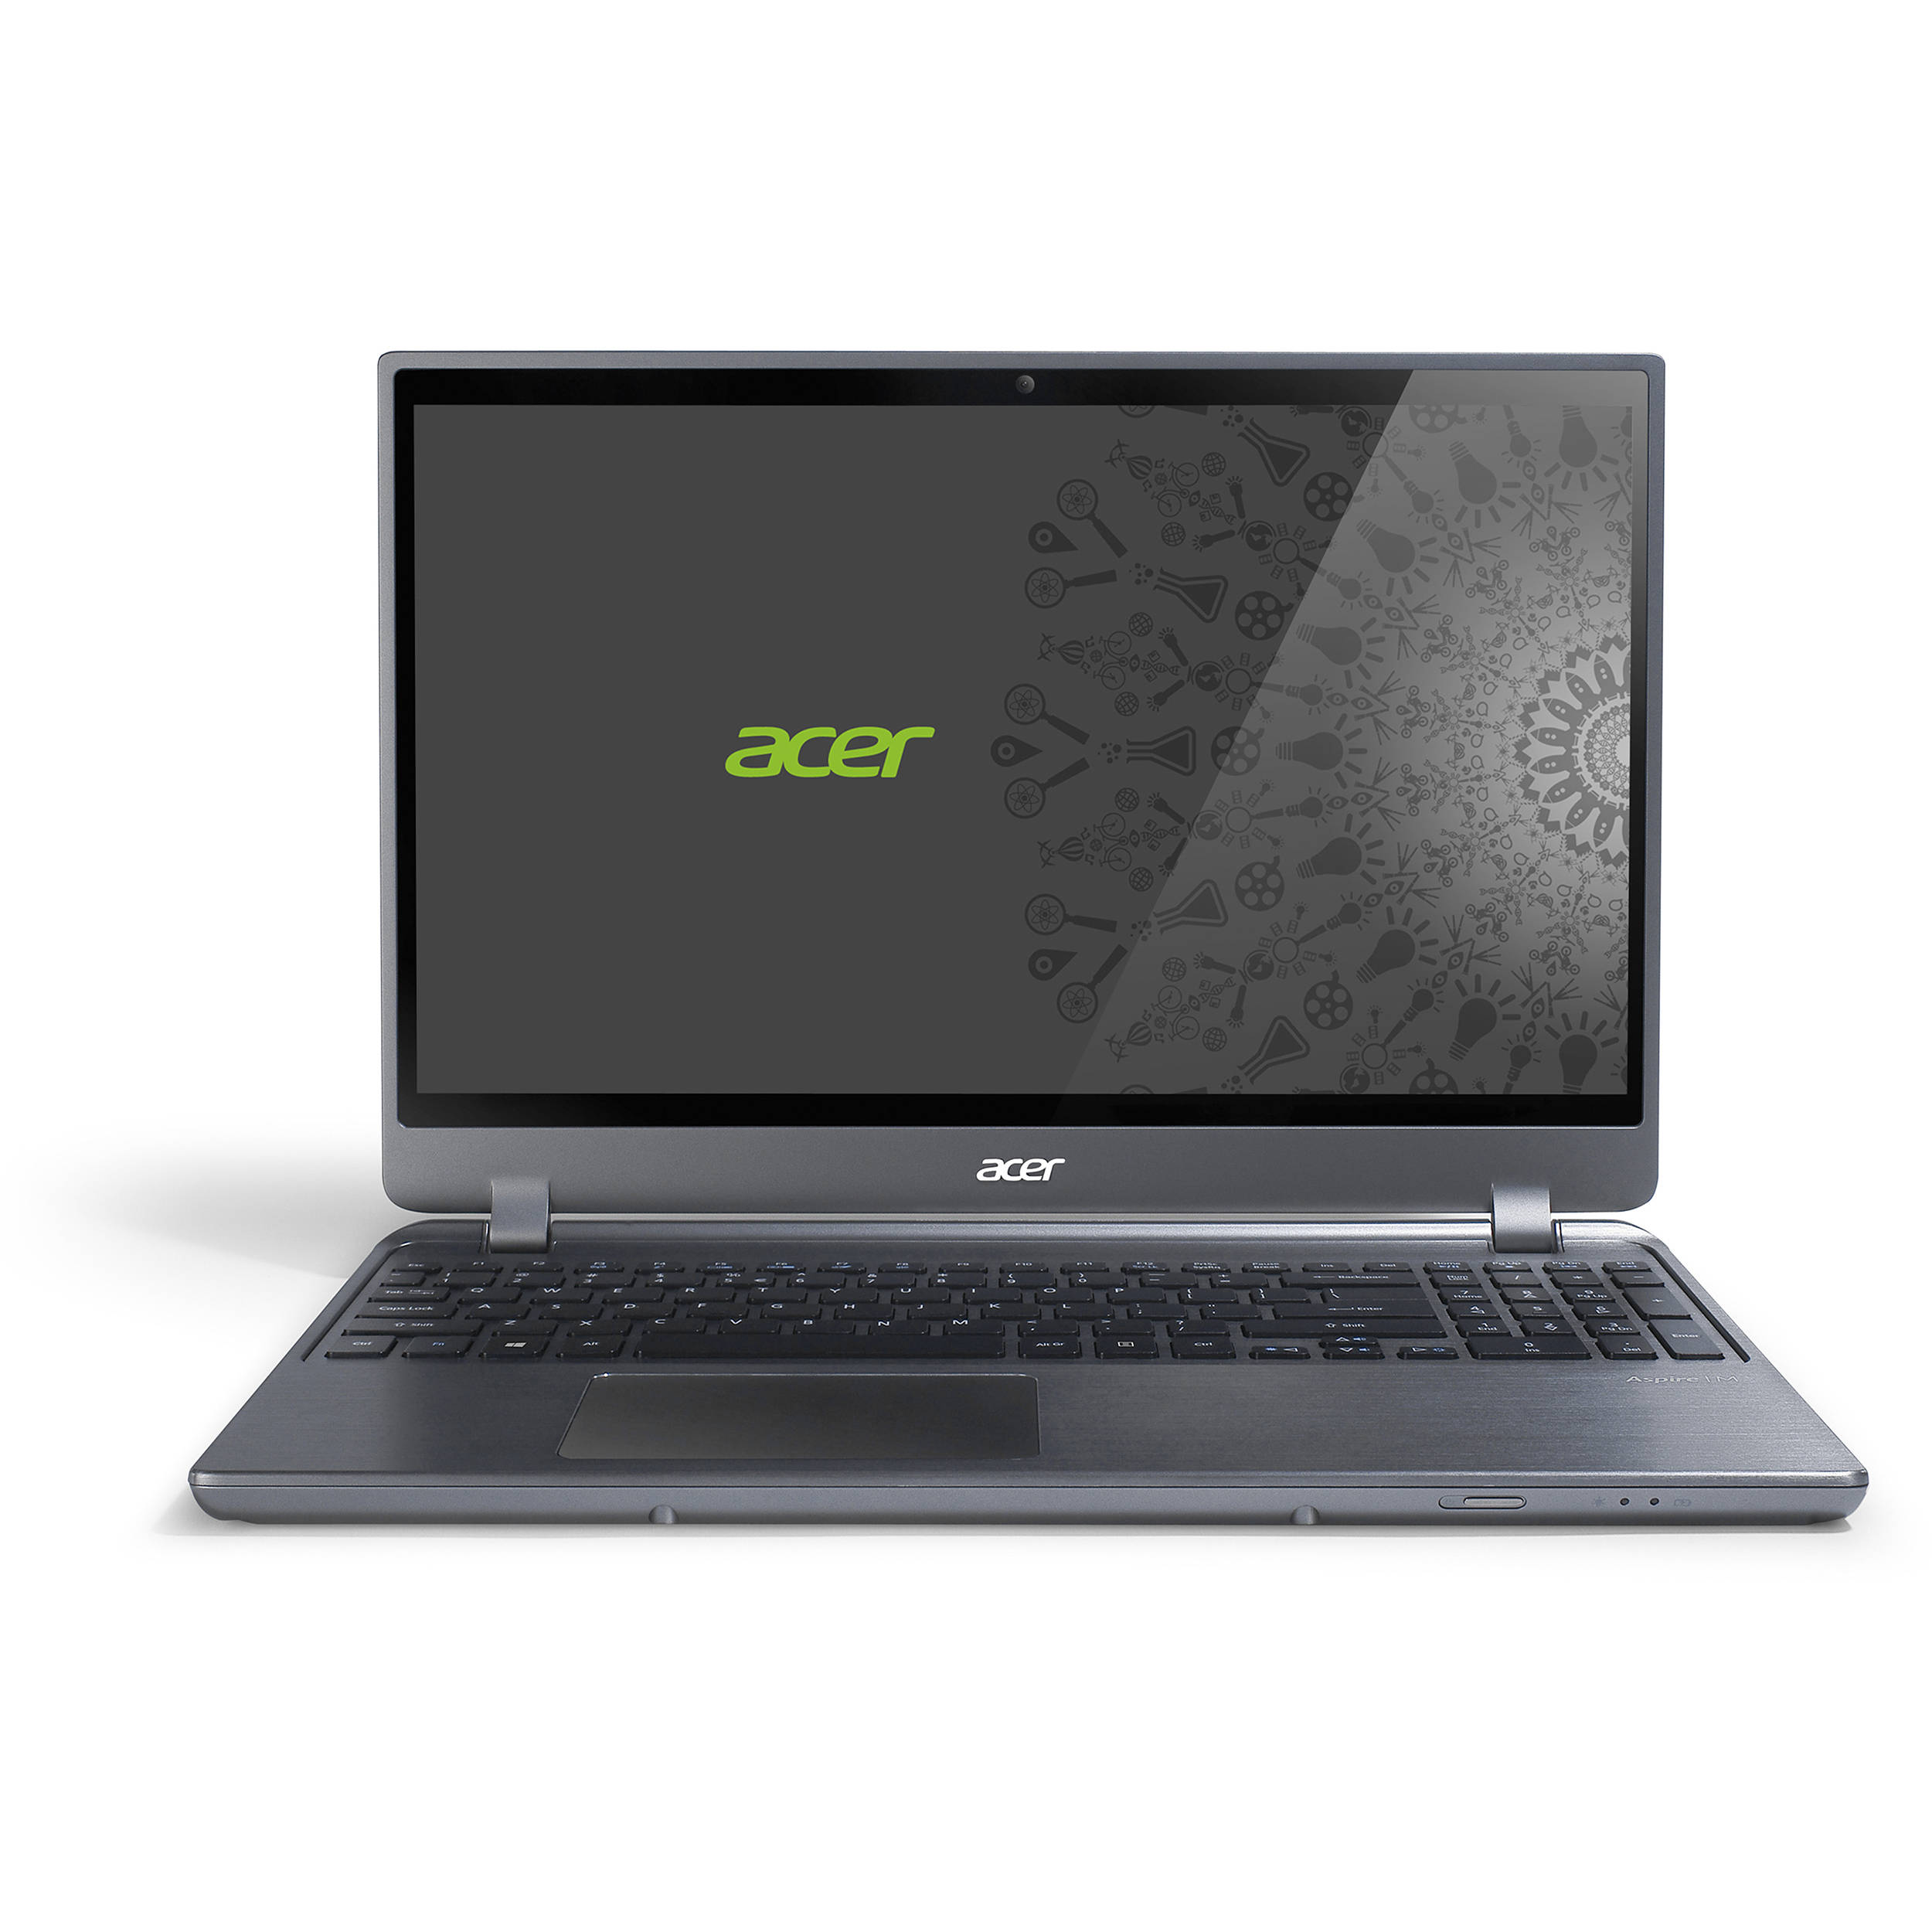 "Acer 15.6"" Intel Core i5 1.70 GHz 6 GB Ram 500 GB HDD Win..."